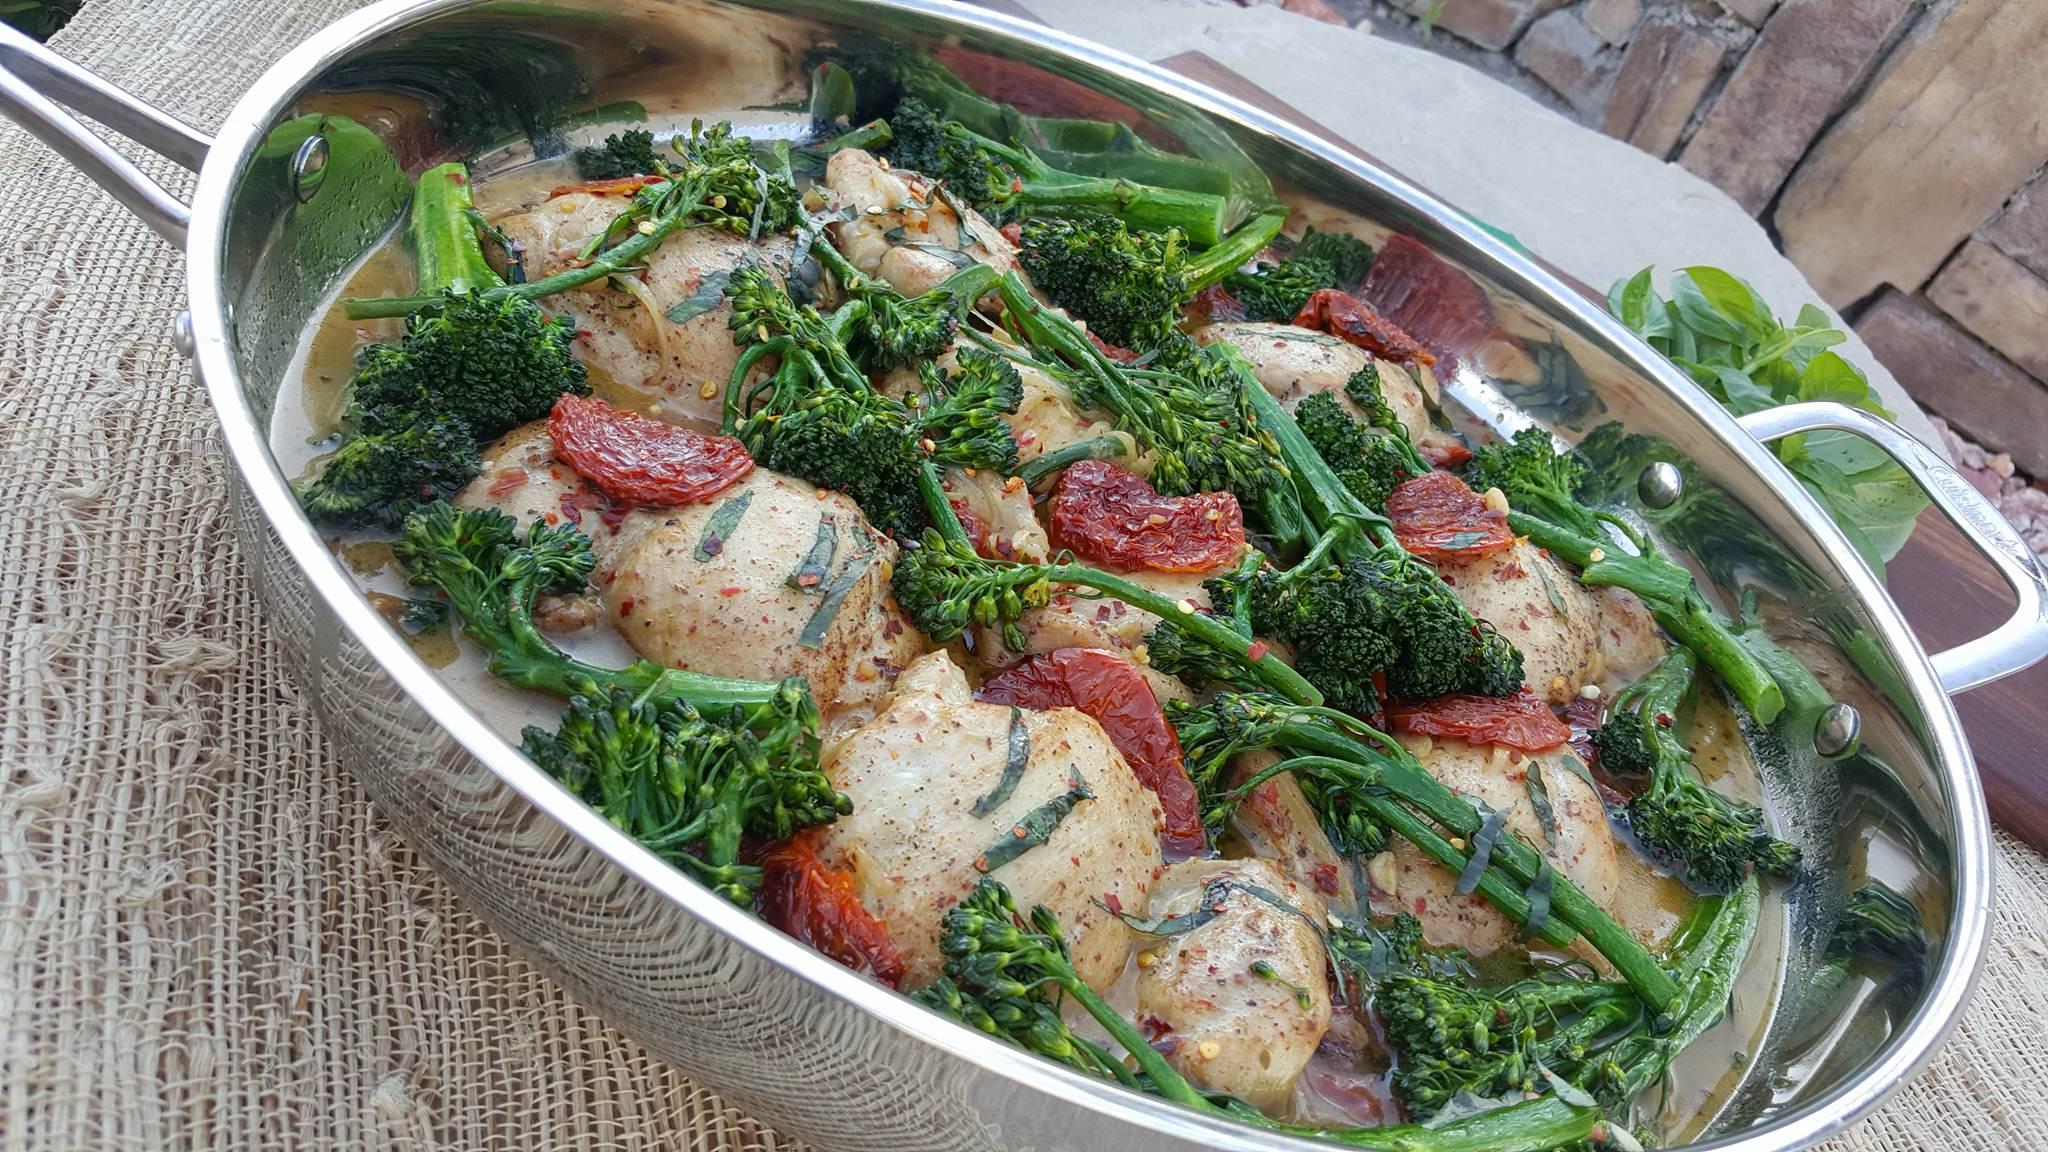 CleanFoodCrush Sundried Tomato Chicken thighs with Broccolini http://cleanfoodcrush.com/sundried-tomato-chicken/